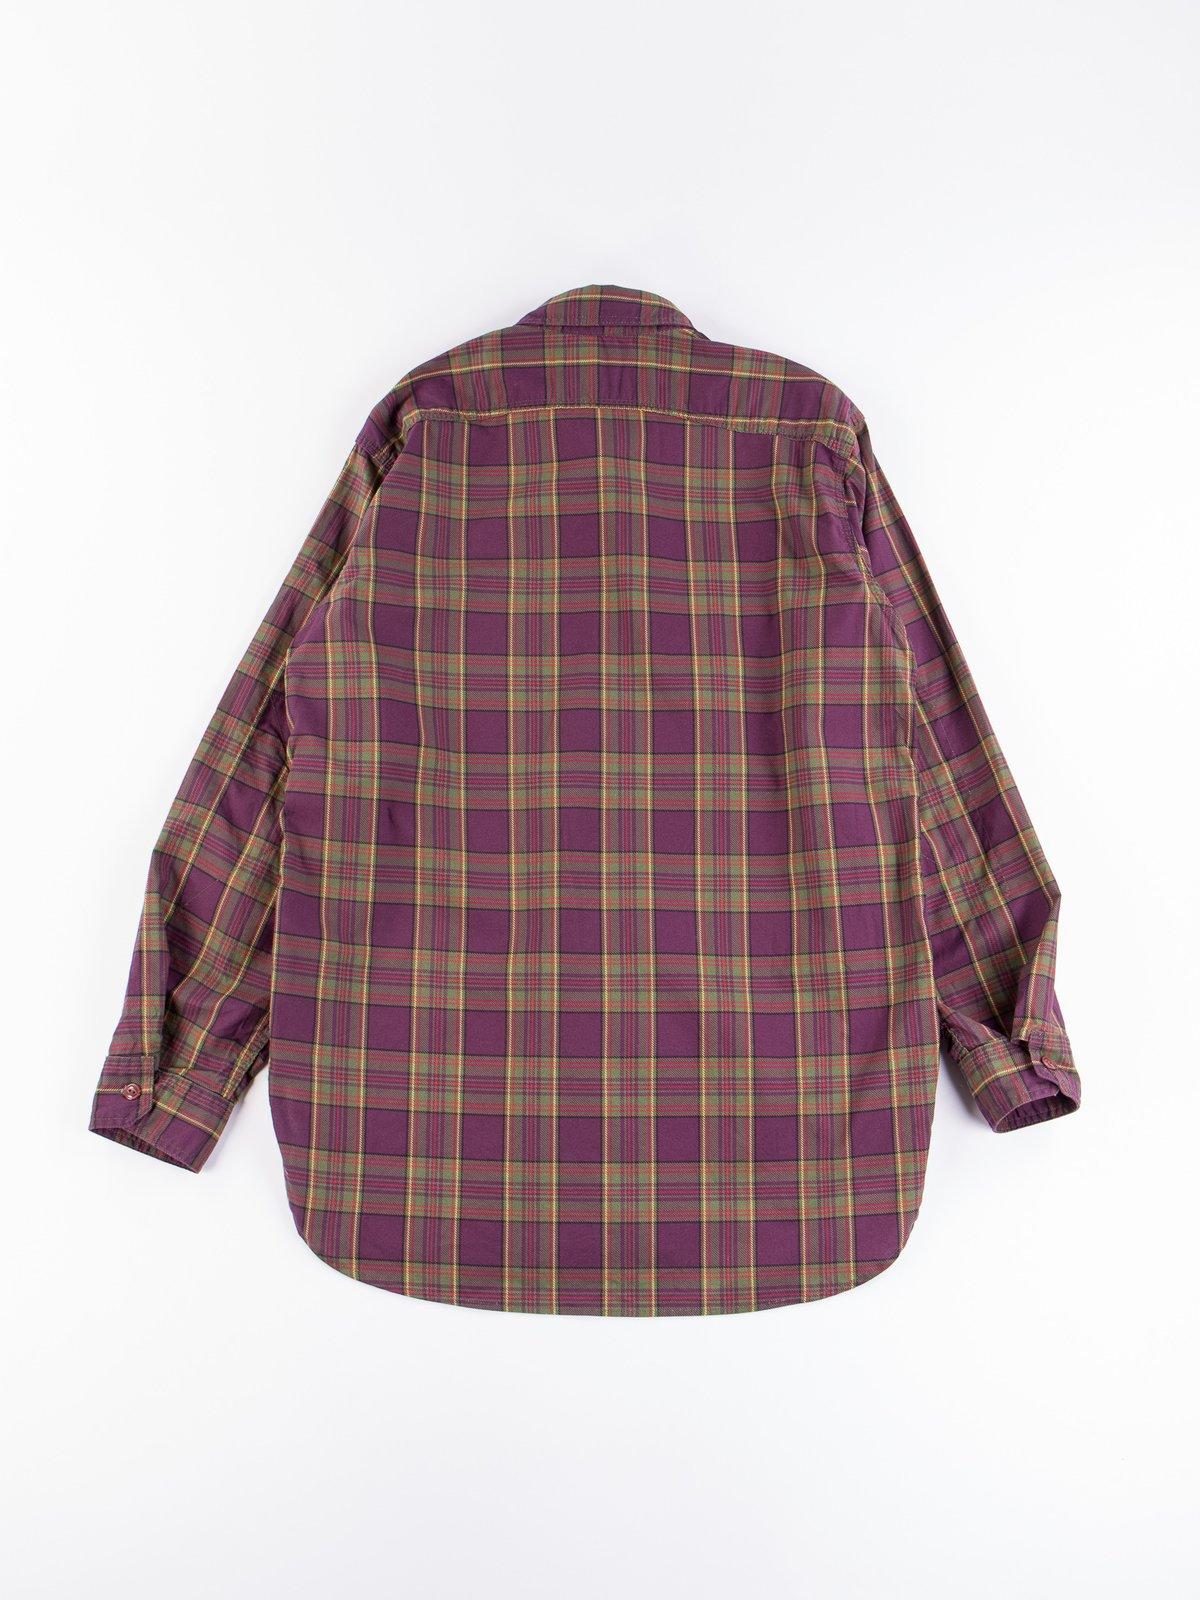 Purple/Green Cotton Printed Plaid Work Shirt - Image 6